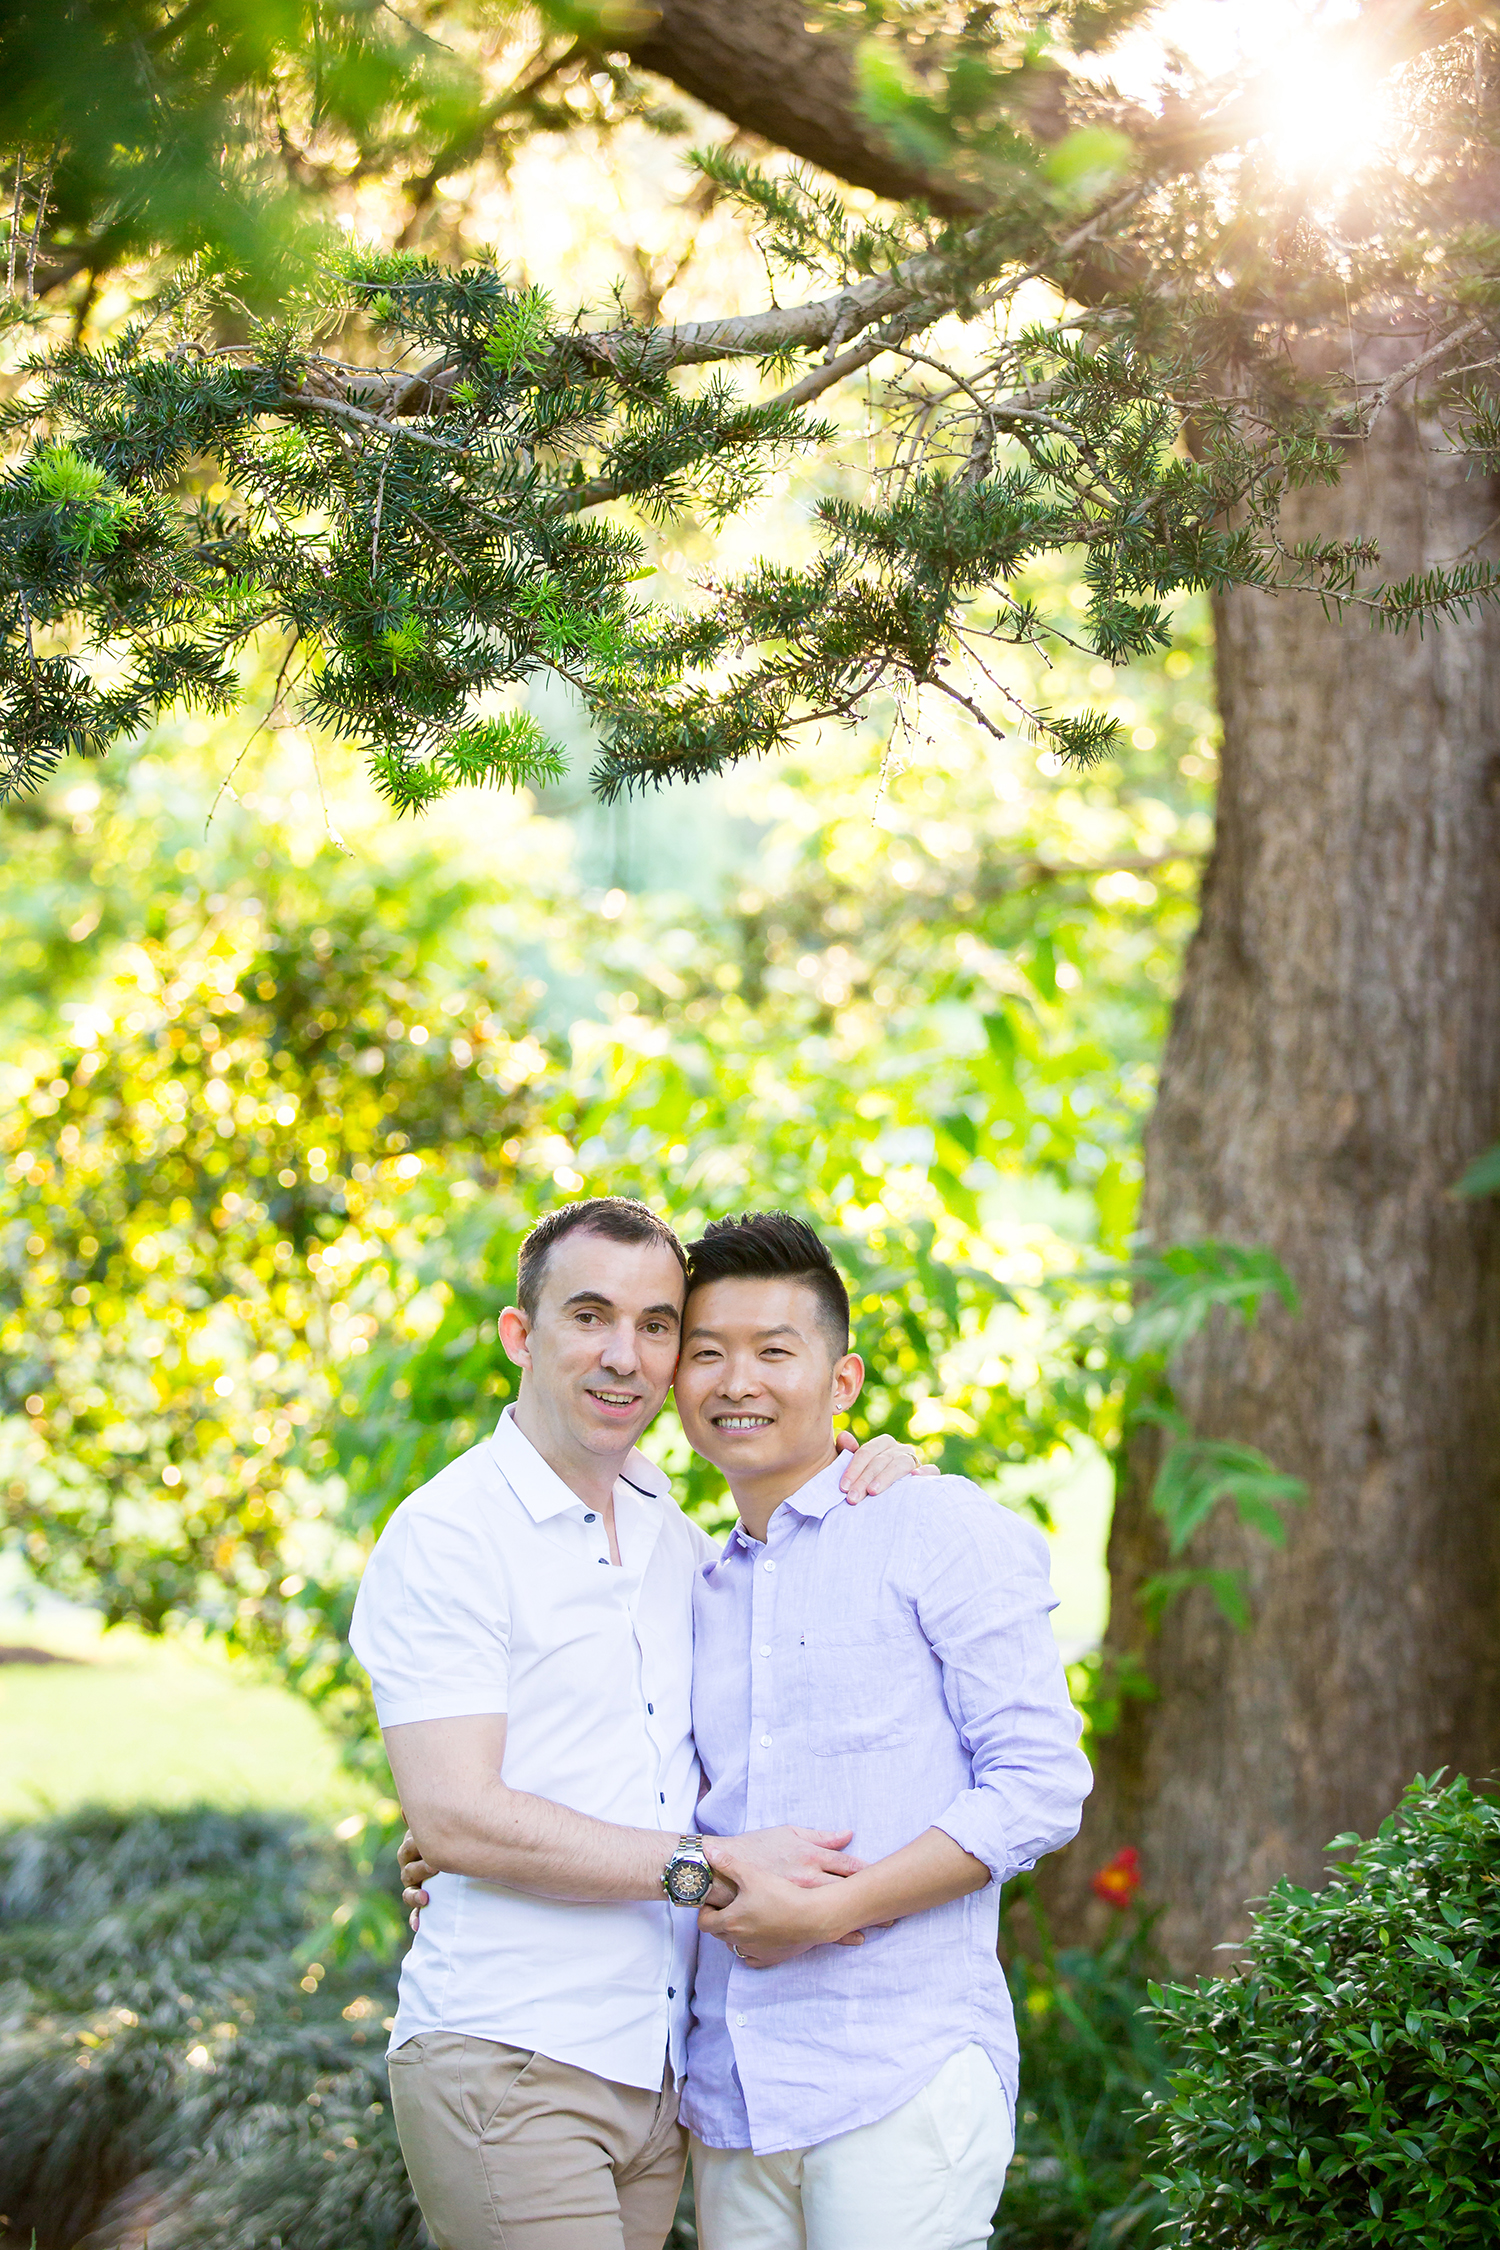 Sydney Gay Wedding Photographer - Jennifer Lam Photography (9).jpg